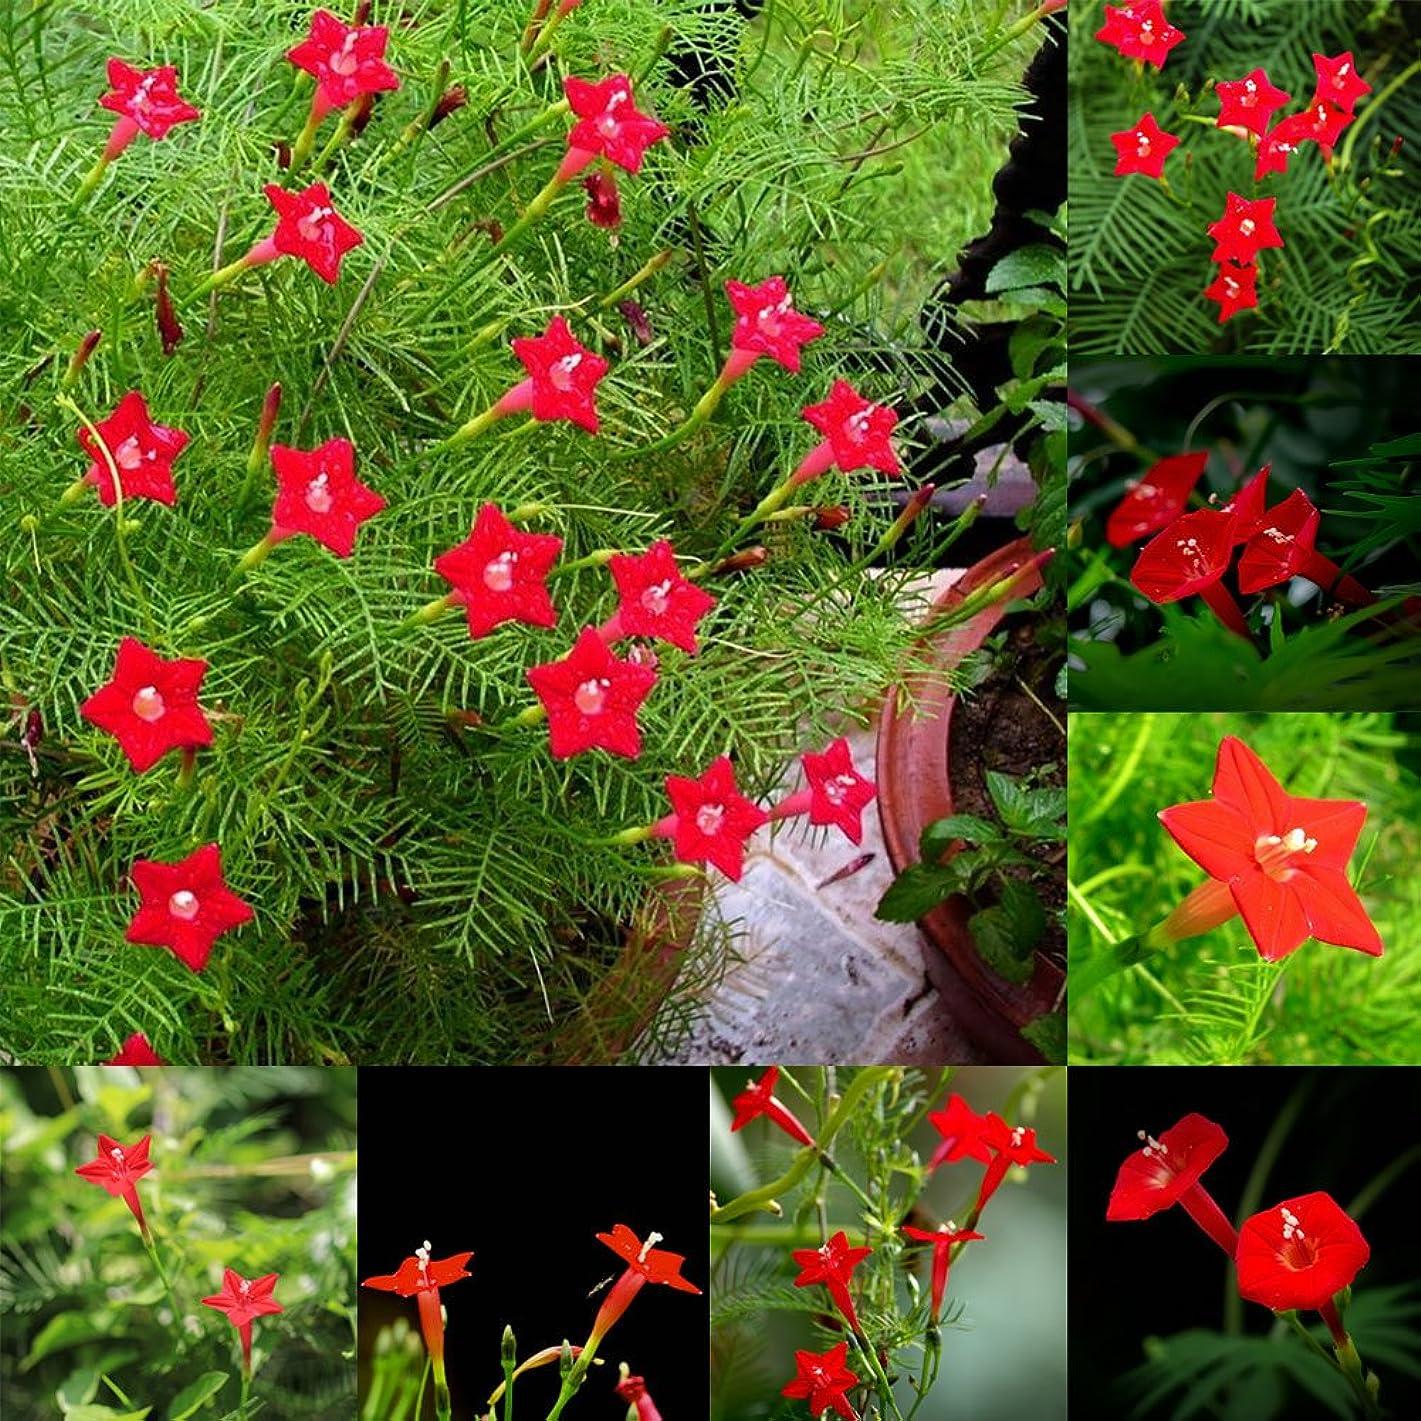 Home Decor Plants Flowers Seeds 50 Pcs Cypress Vine Seeds Annual Climbing Plant Flower Garden Home Decor Bonsai - Cypress Vine Seeds